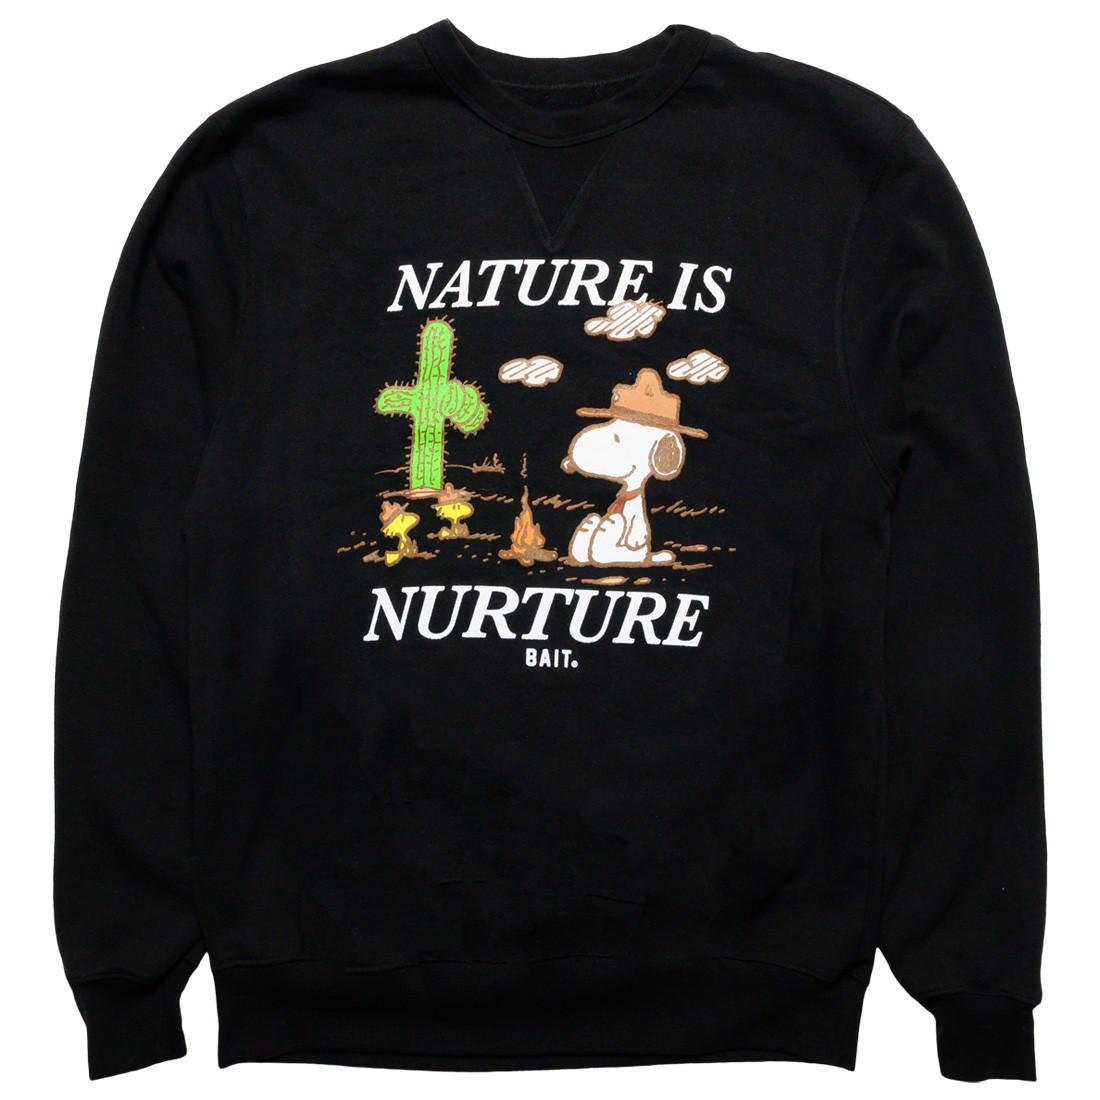 BAIT x Snoopy x Upcycle Men Nature Is Nurture Crewneck Sweater (black)